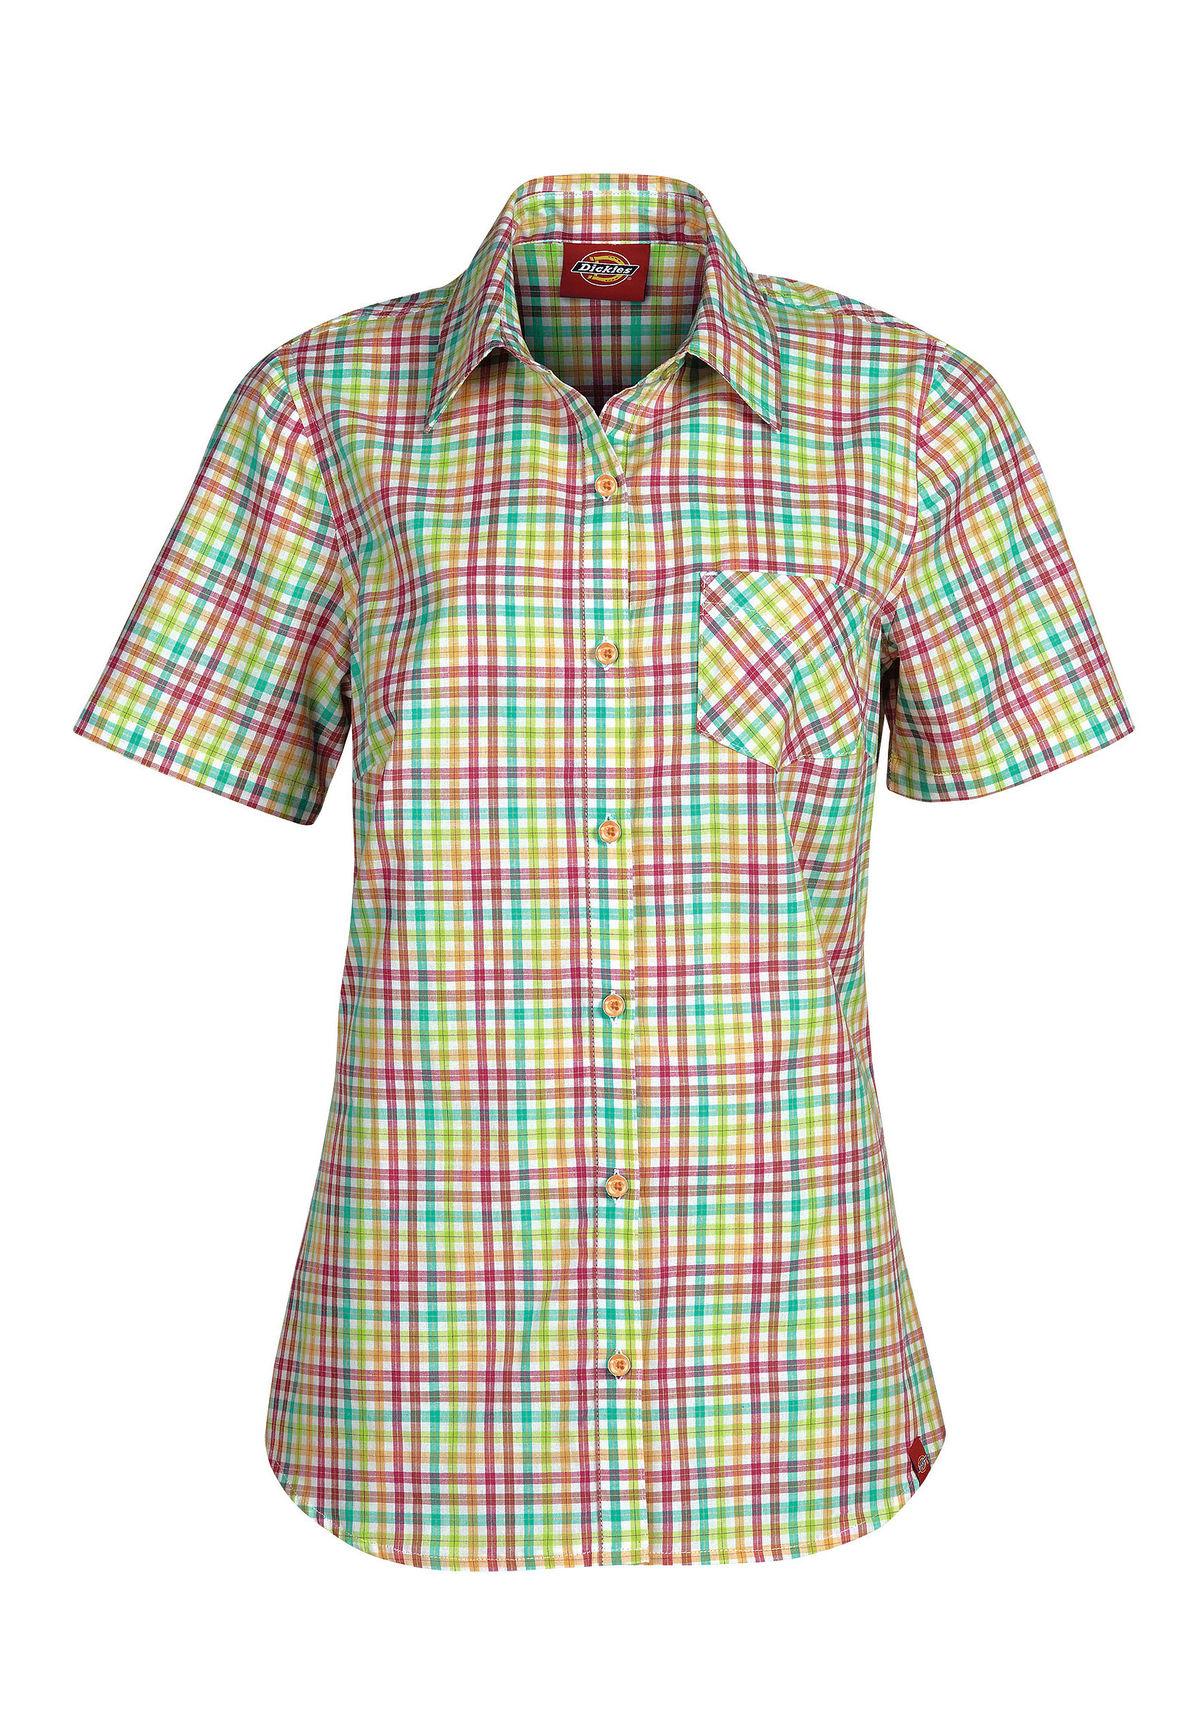 Dickies fs092 women 39 s short sleeve plaid shirt ebay for Dickies short sleeve plaid shirt